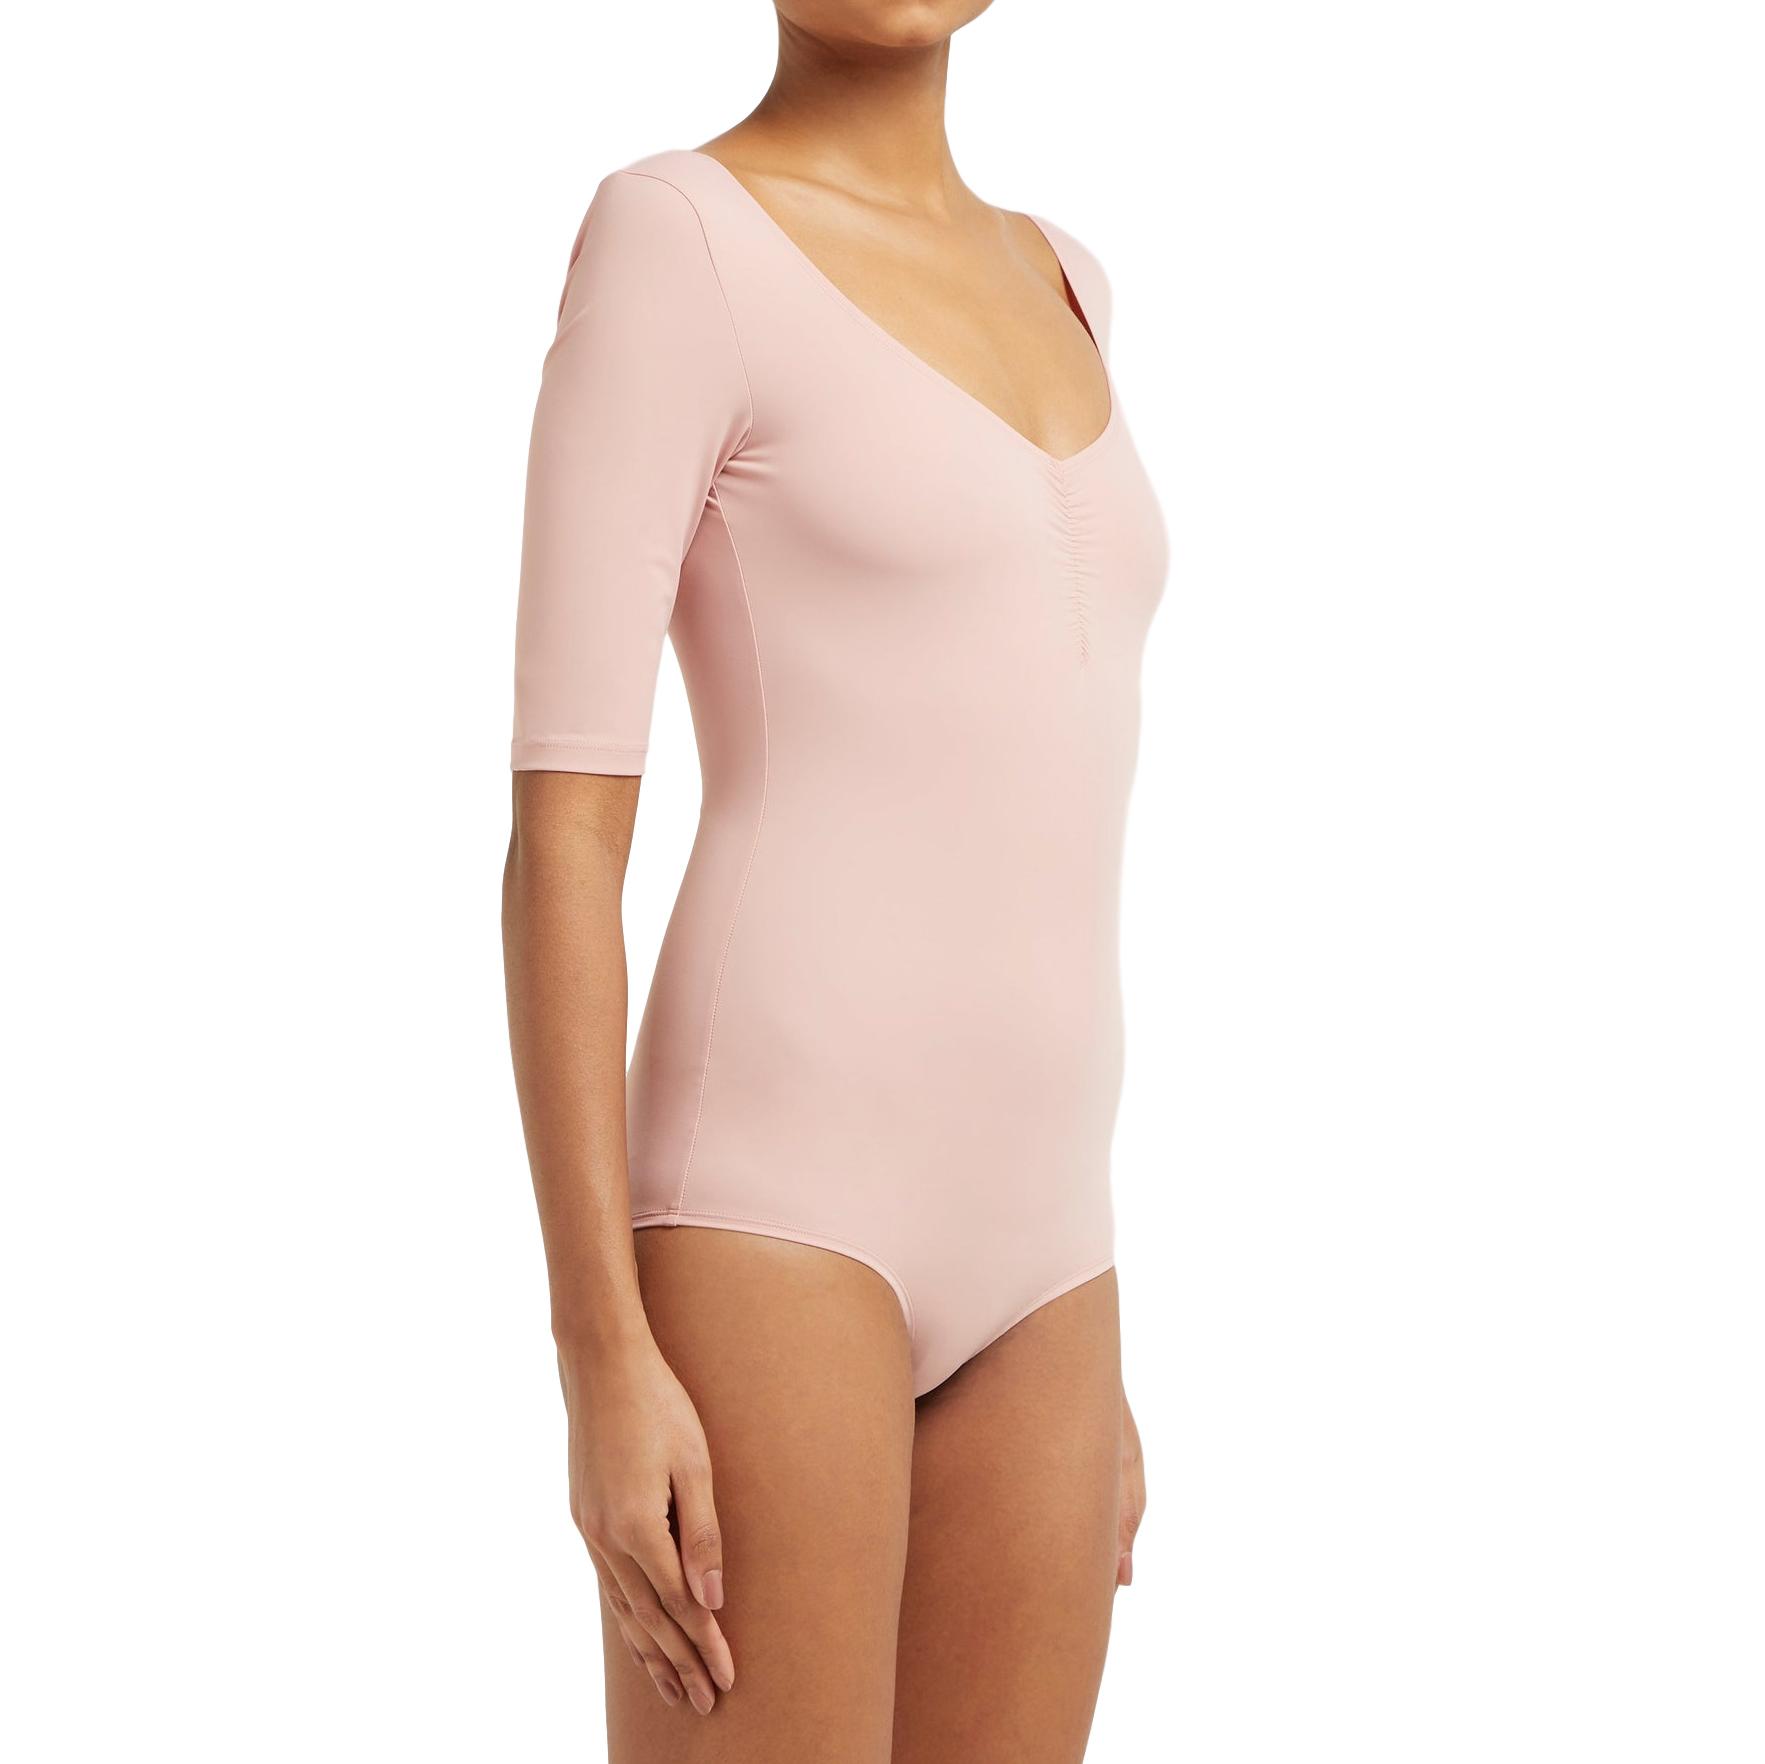 Ernest Leoty Blush Pink Ruched Bodysuit